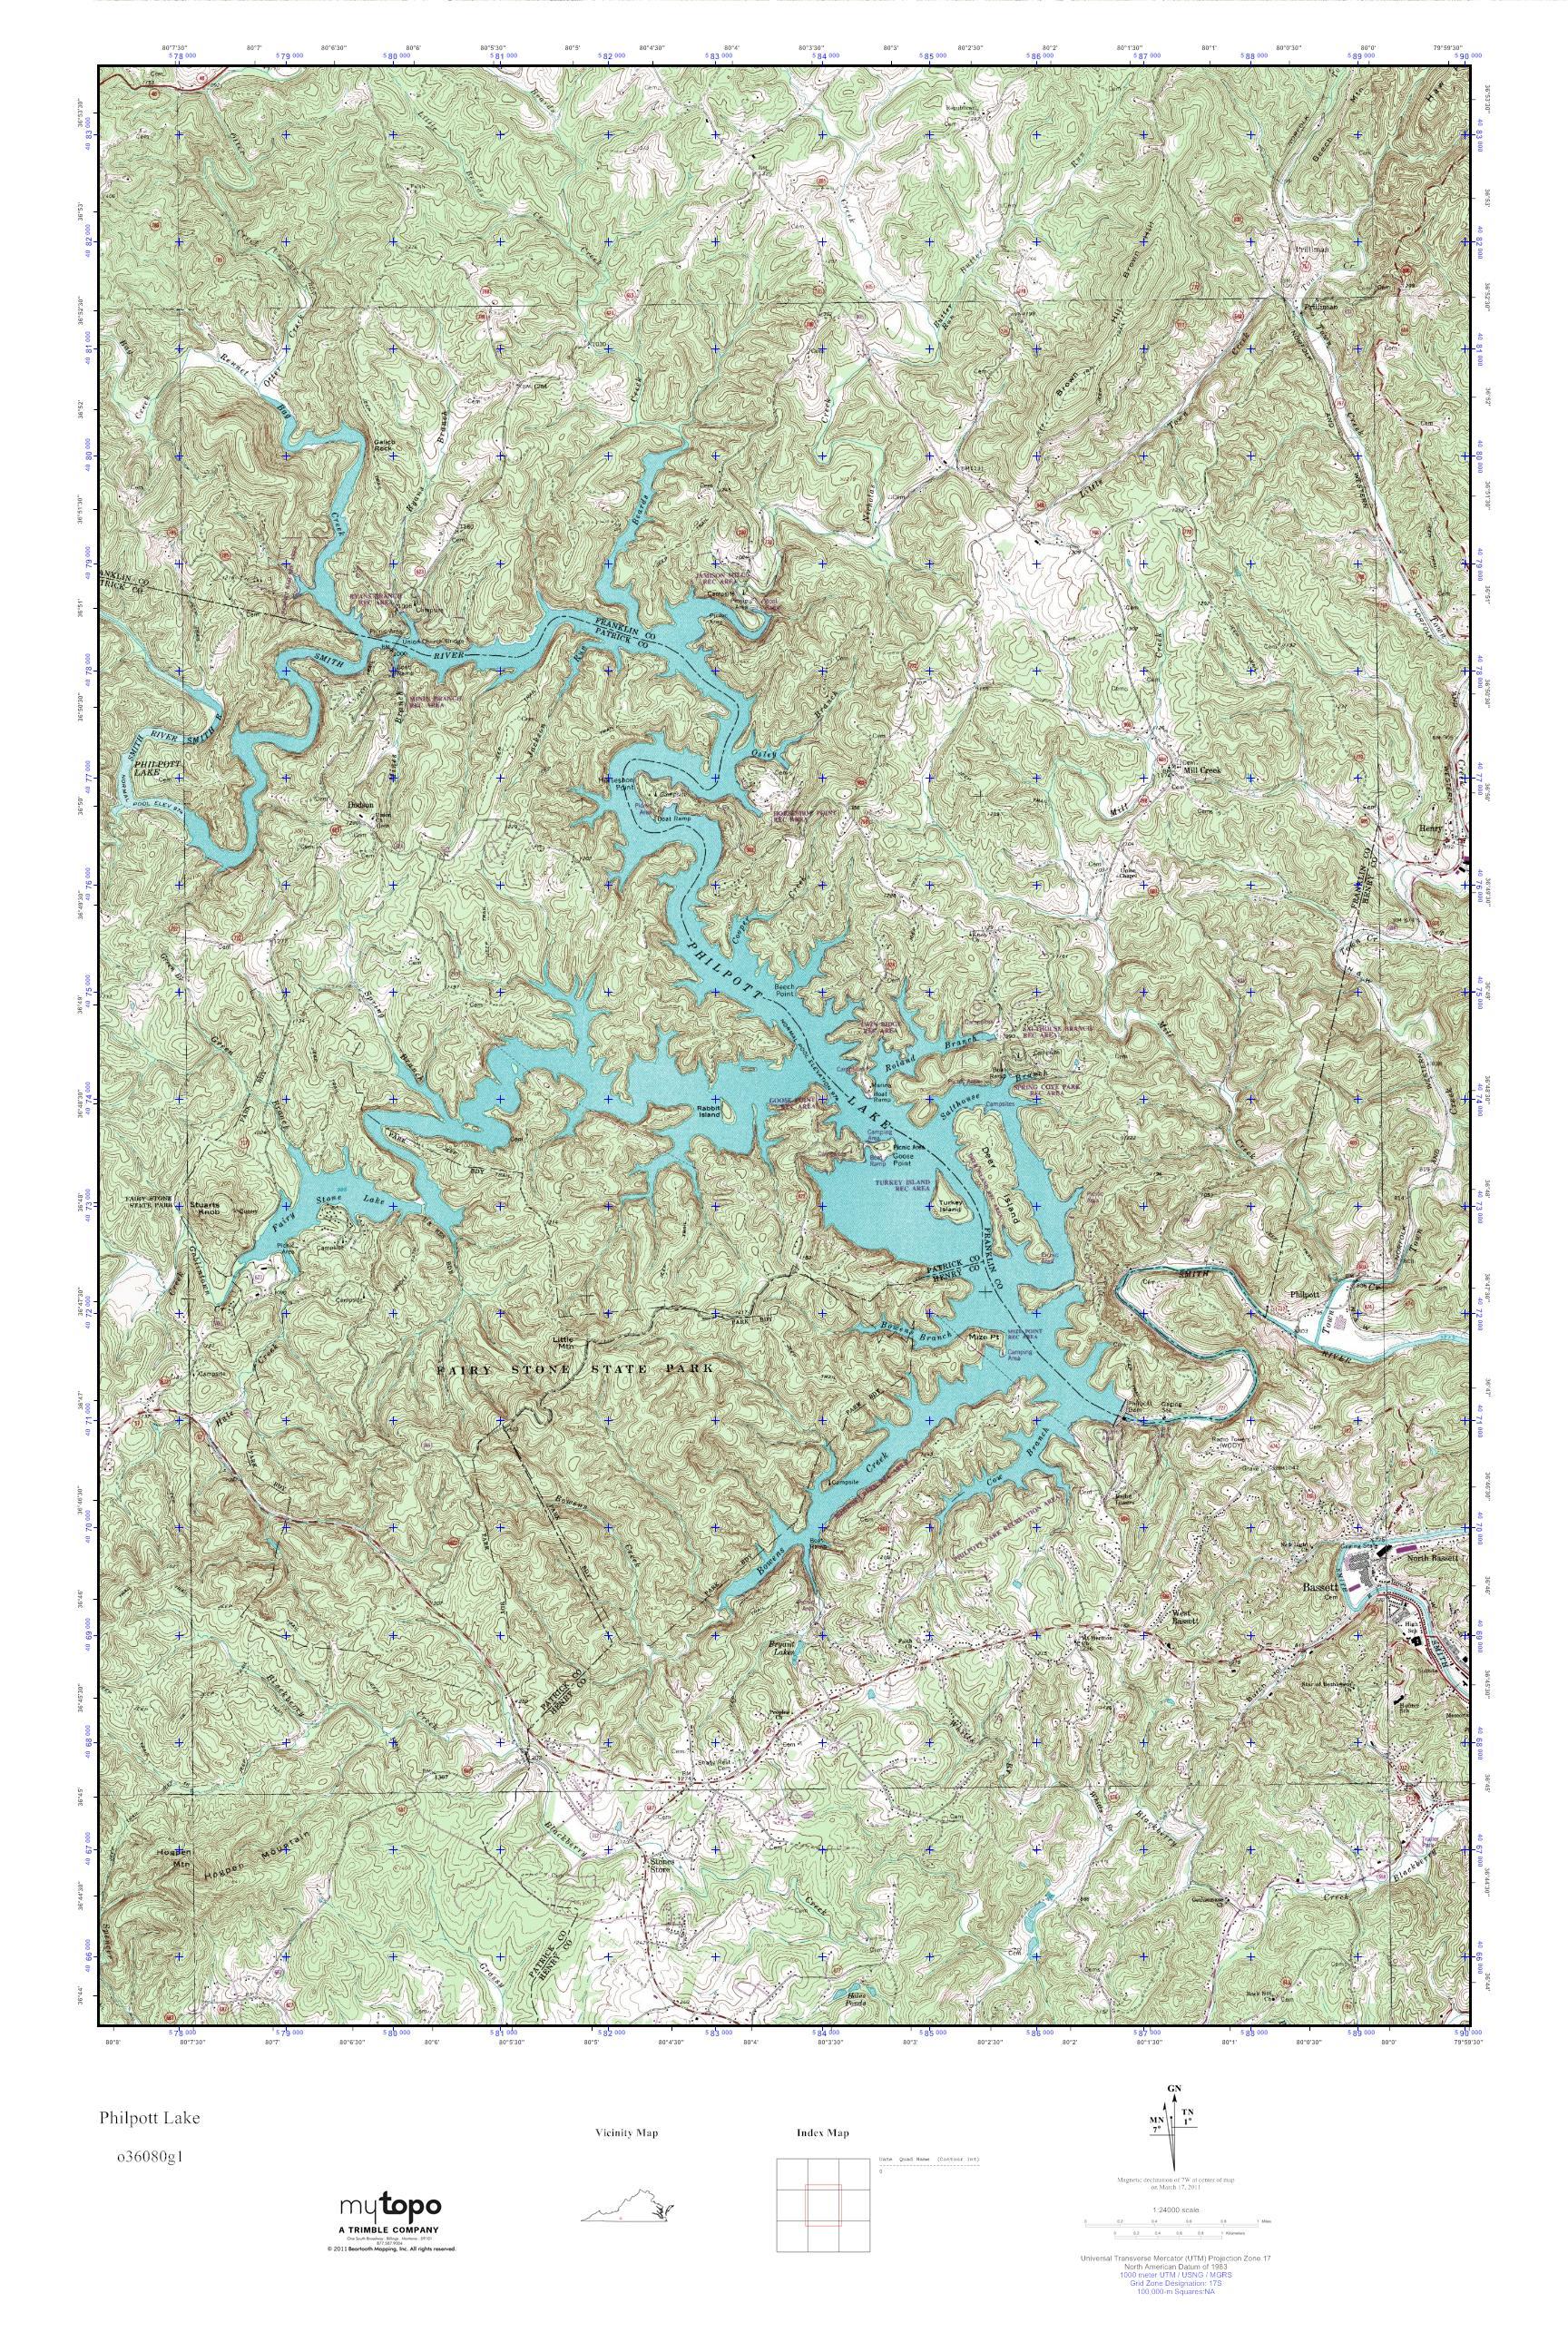 Mytopo Philpott Lake Virginia Usgs Quad Topo Map